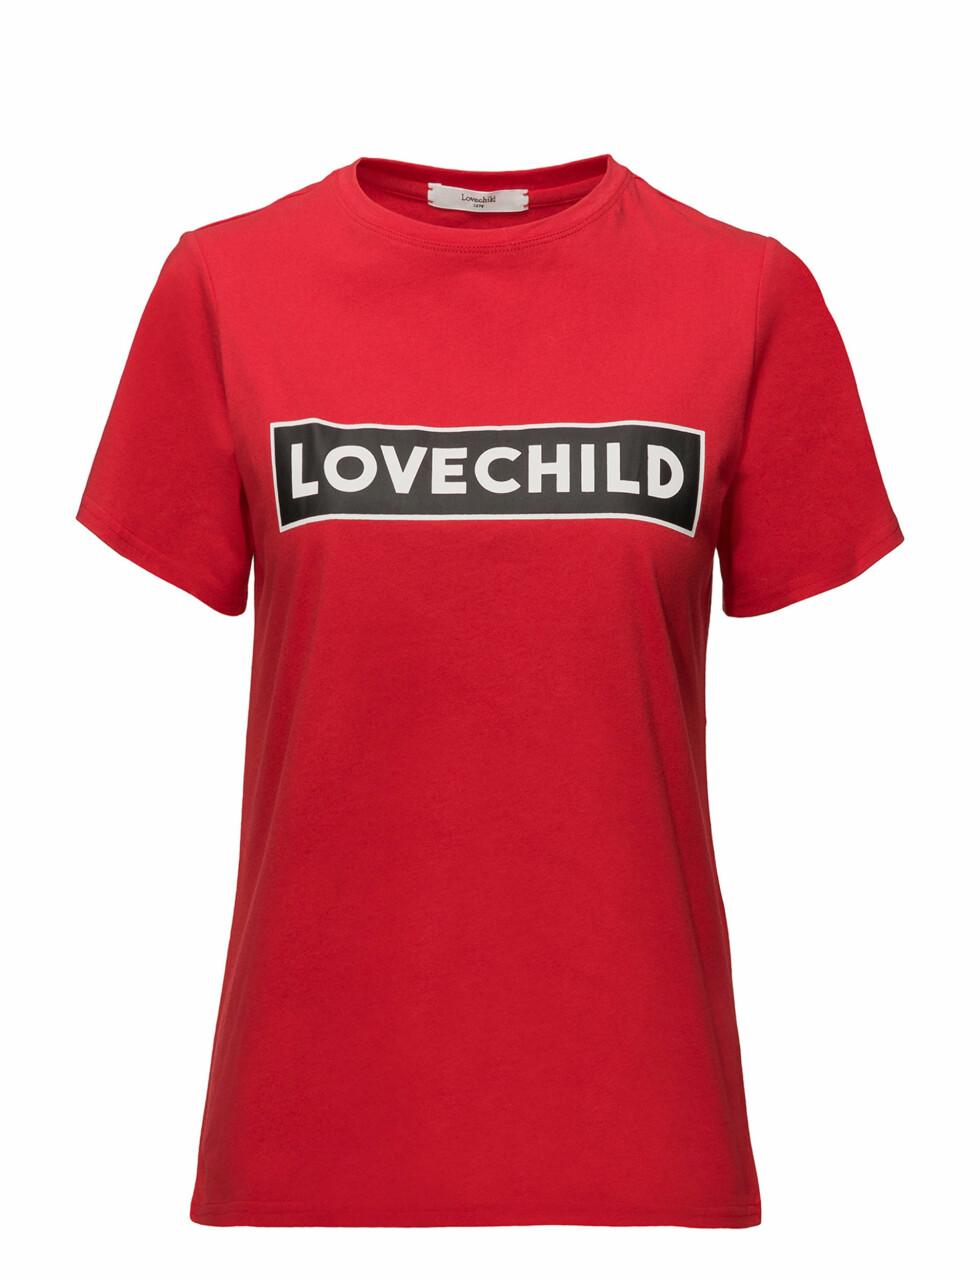 T-skjorte fra Lovechild 1979 |695,-| https://www.boozt.com/no/no/lovechild-1979/alyssa-t-shirt_16898798/16898799?navId=67384&group=listing&position=1000000